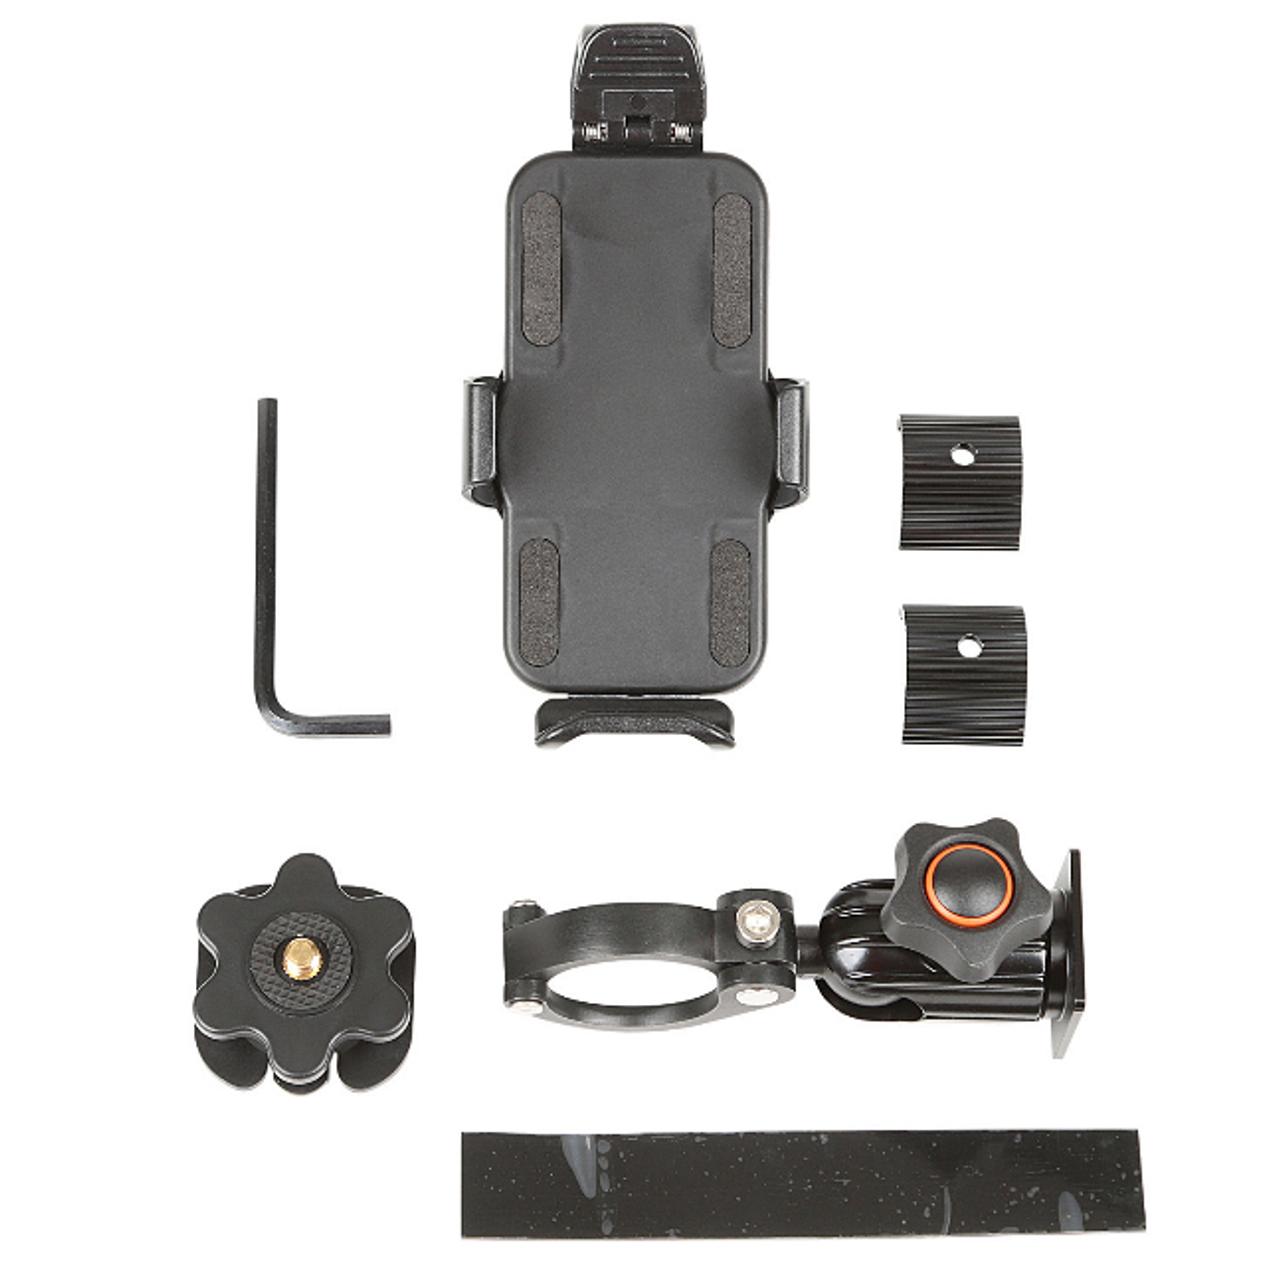 Rugged Ridge 13551.37 Cell Phone/GPS Mount for Gear-Vise Dash Bar for Jeep Wrangler JL & Gladiator JT 2018+